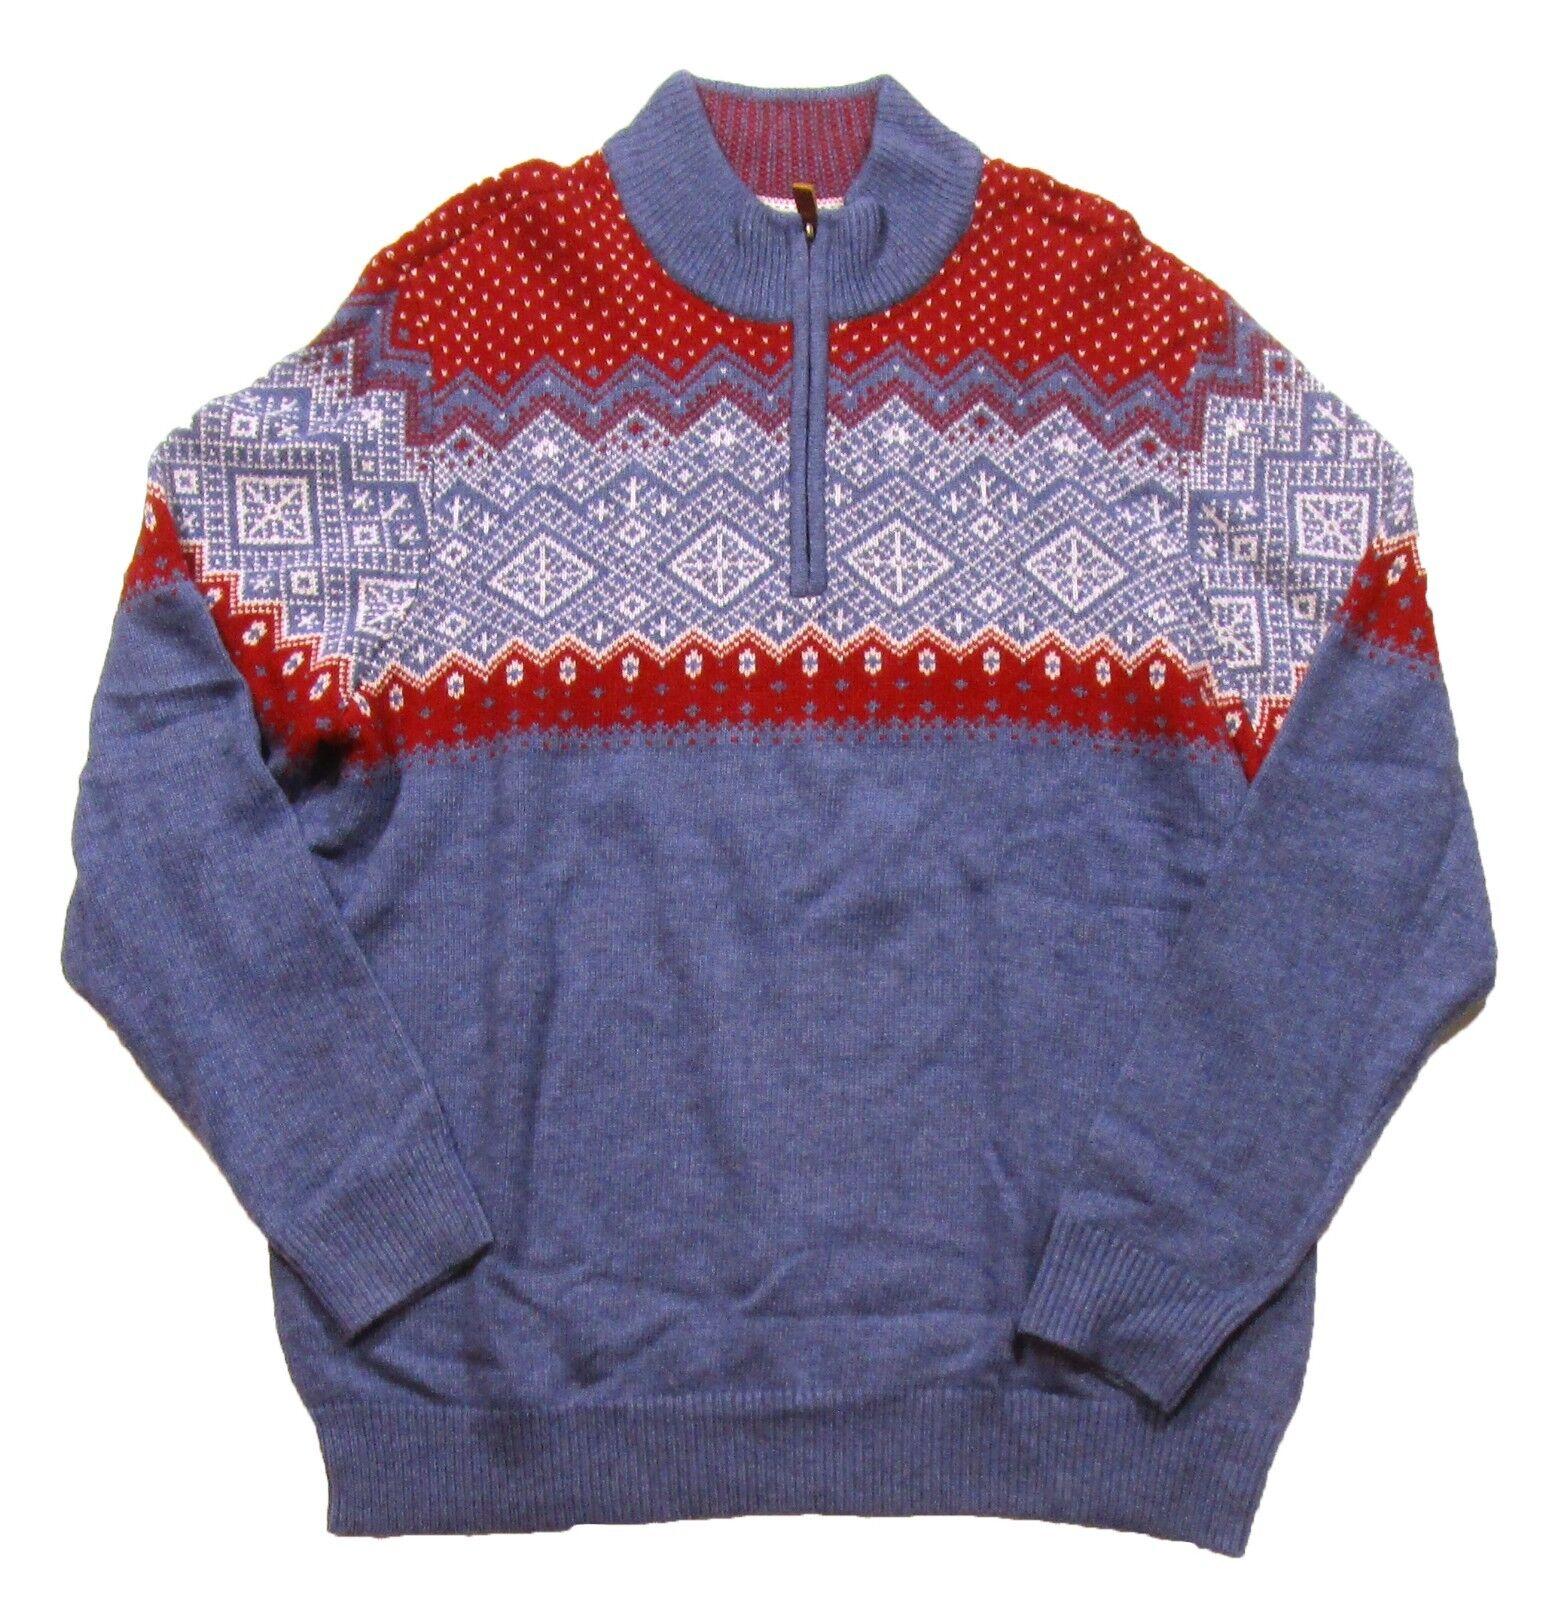 Vineyard Vines Men's Moonshine bluee Holiday Fairisle Wool Blend 1 4 Zip Sweater